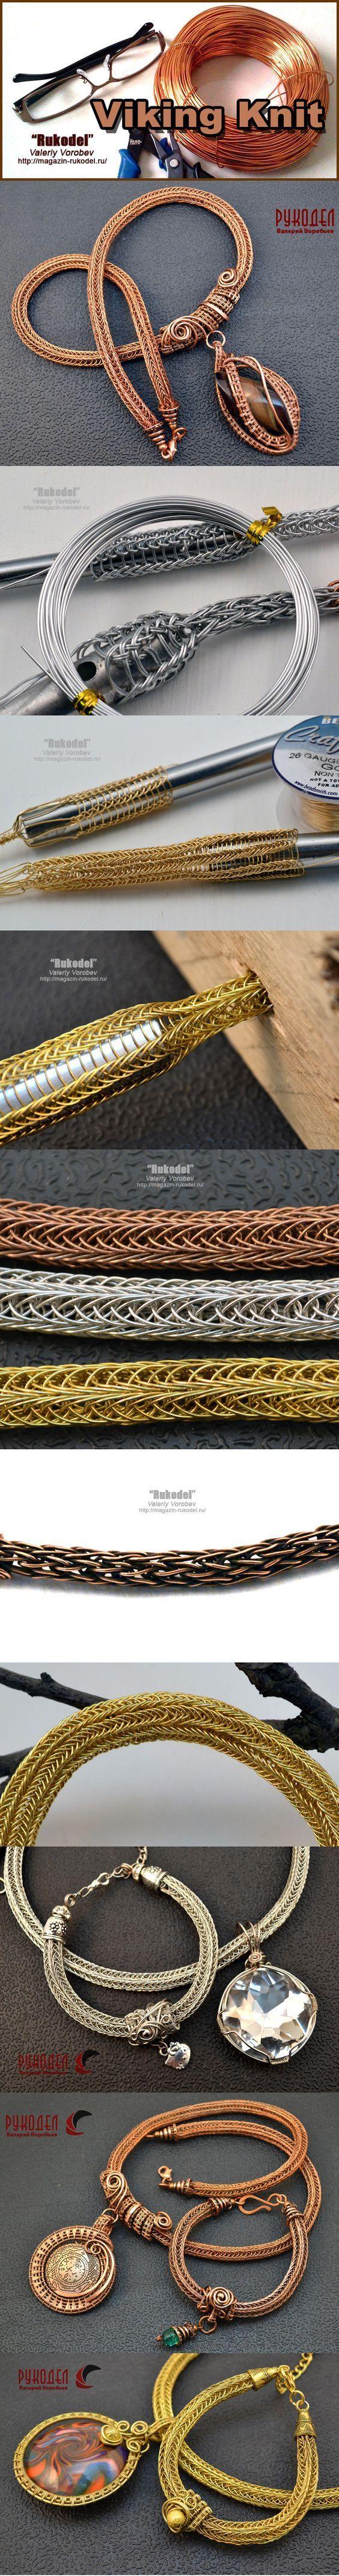 Viking Knit - http://magazin-rukodel.ru/: | Handgefertigter Schmuck ...